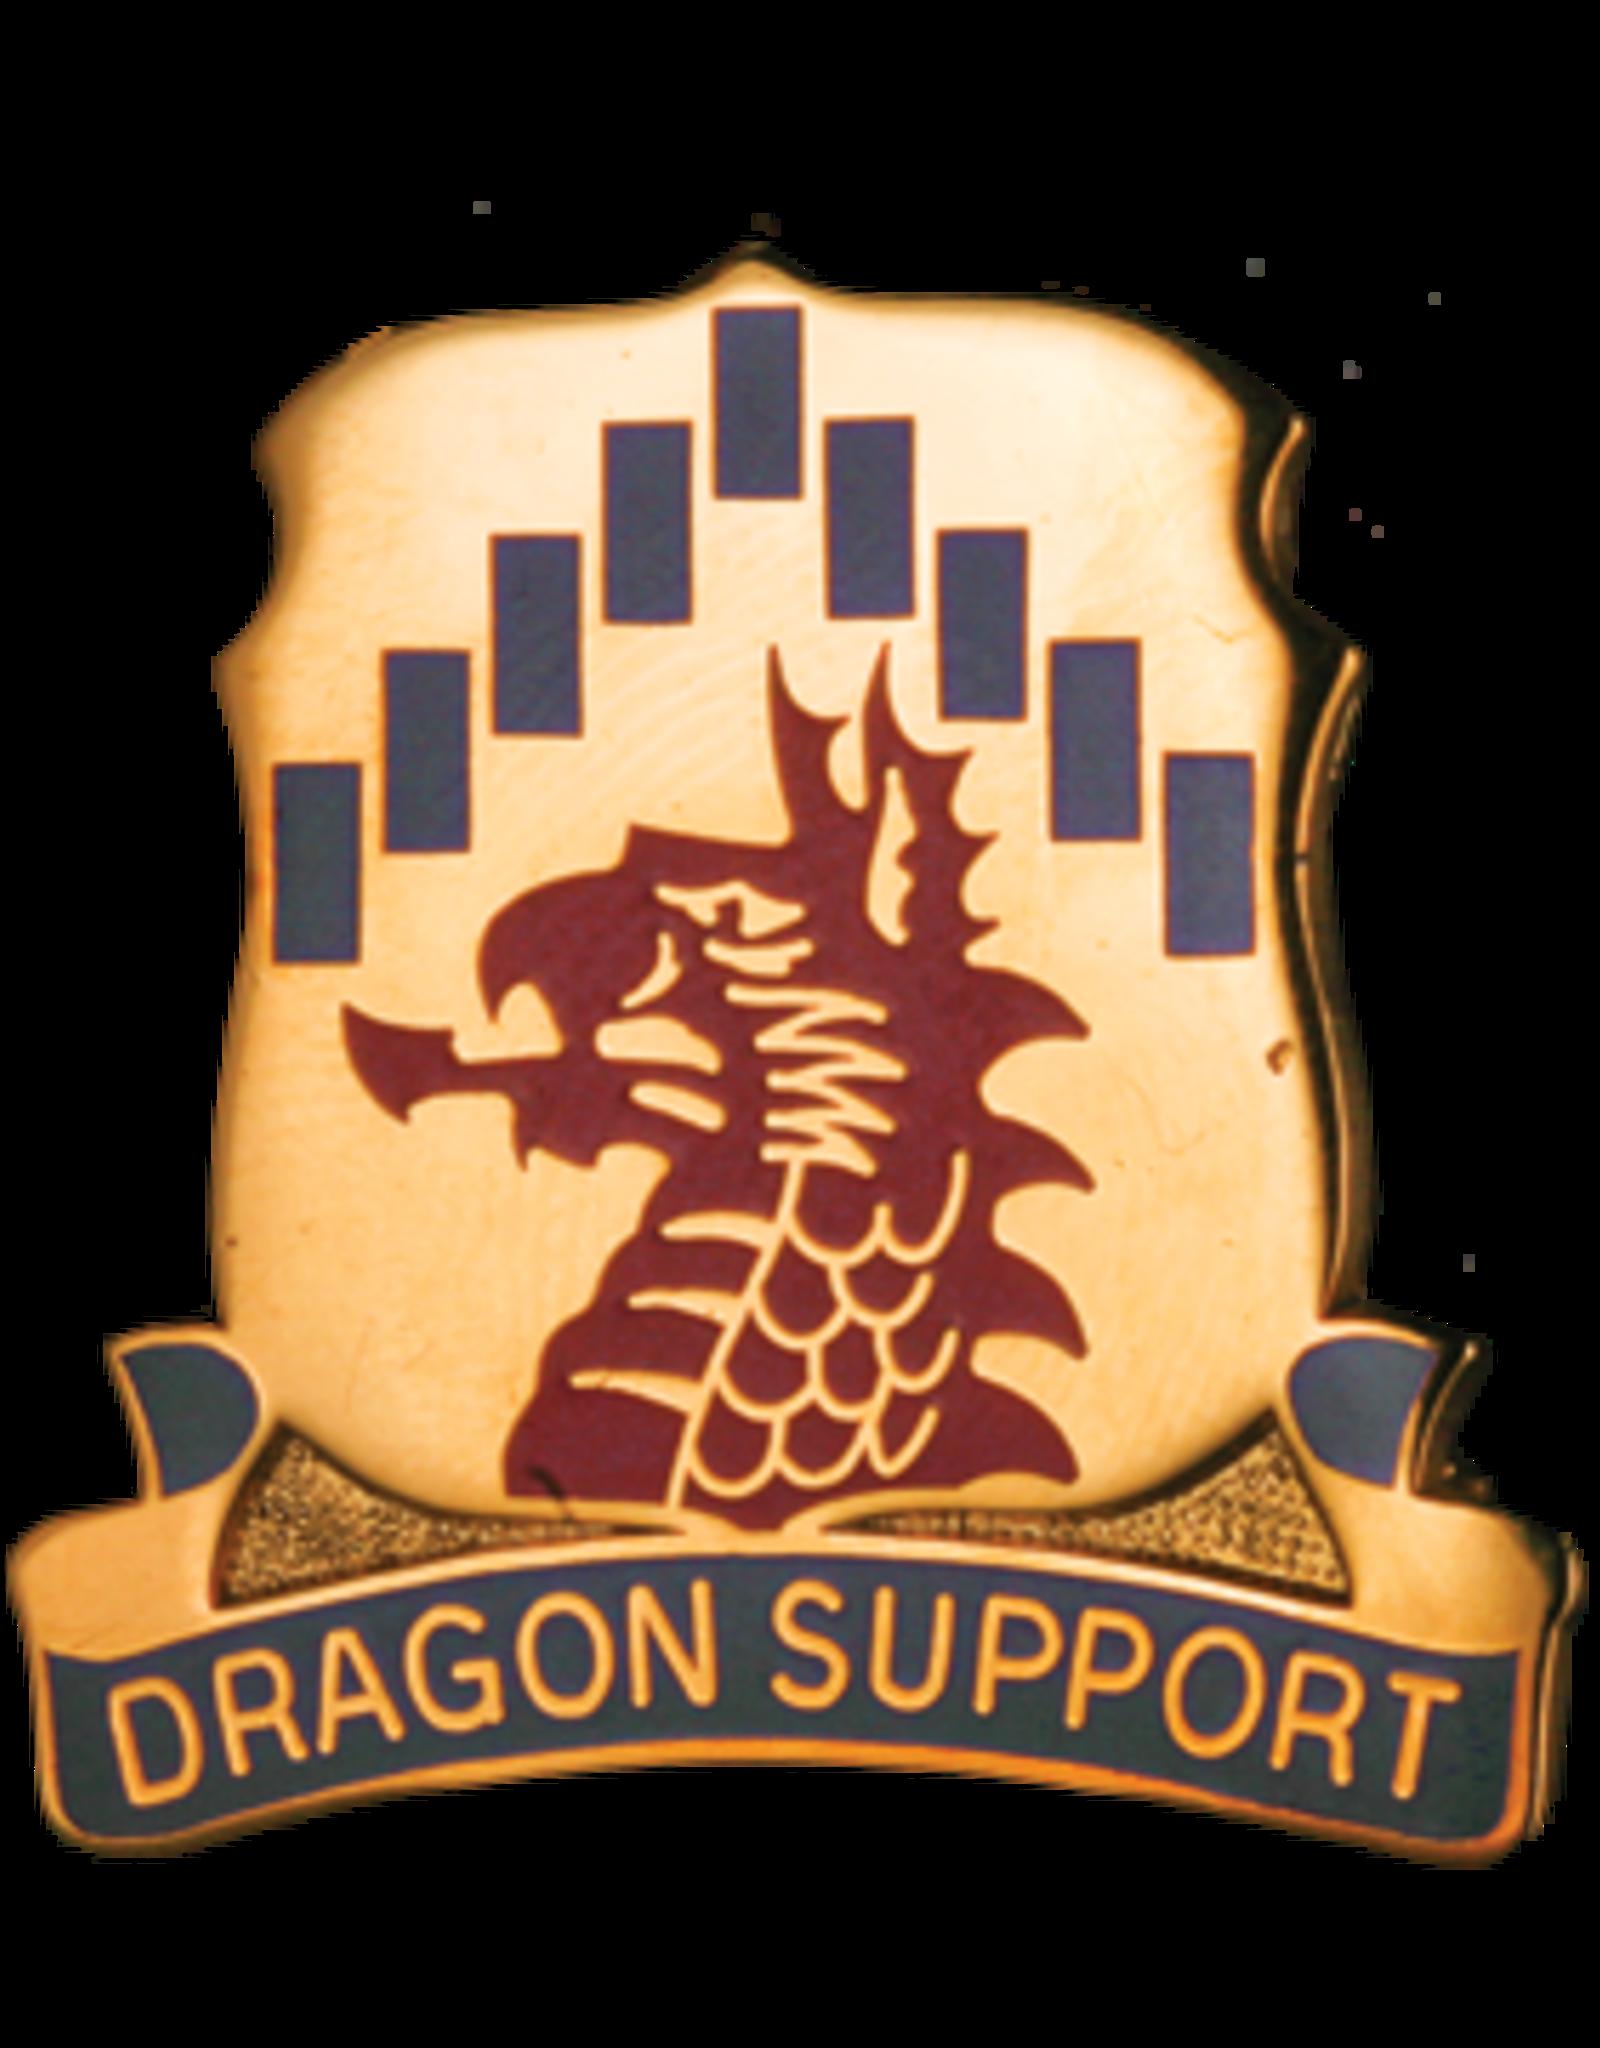 601st Support Battalion Unit Crest - Dragon Support